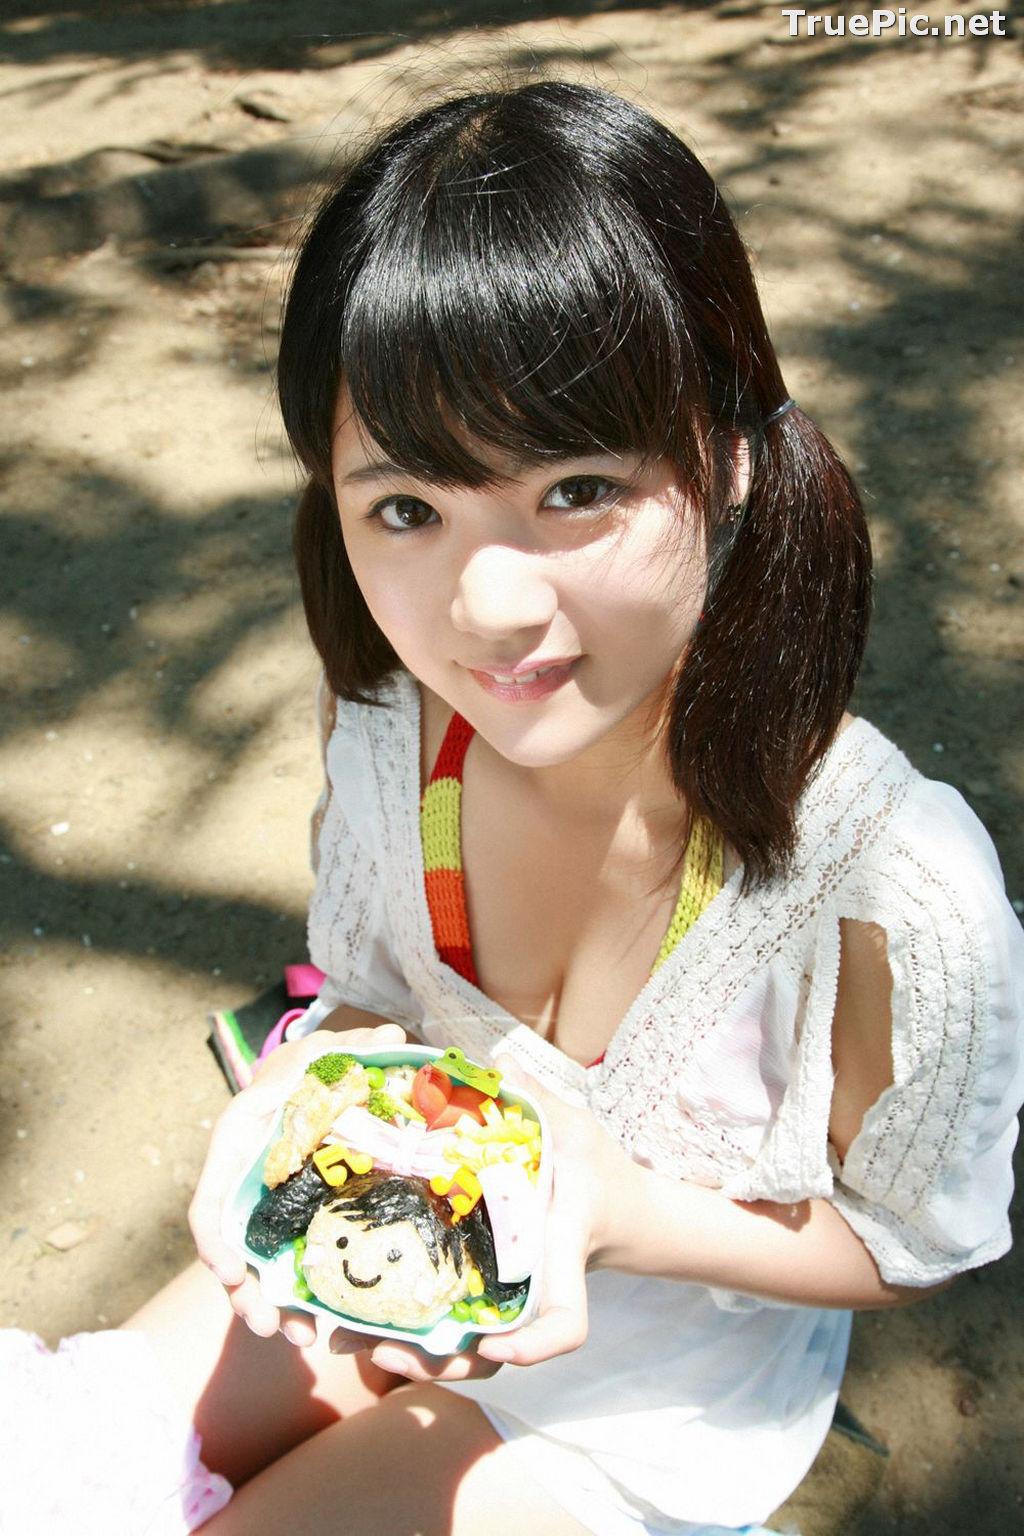 Image [YS Web] Vol.448 - Japanese Gravure Idol - Hikari Agarie - TruePic.net - Picture-2